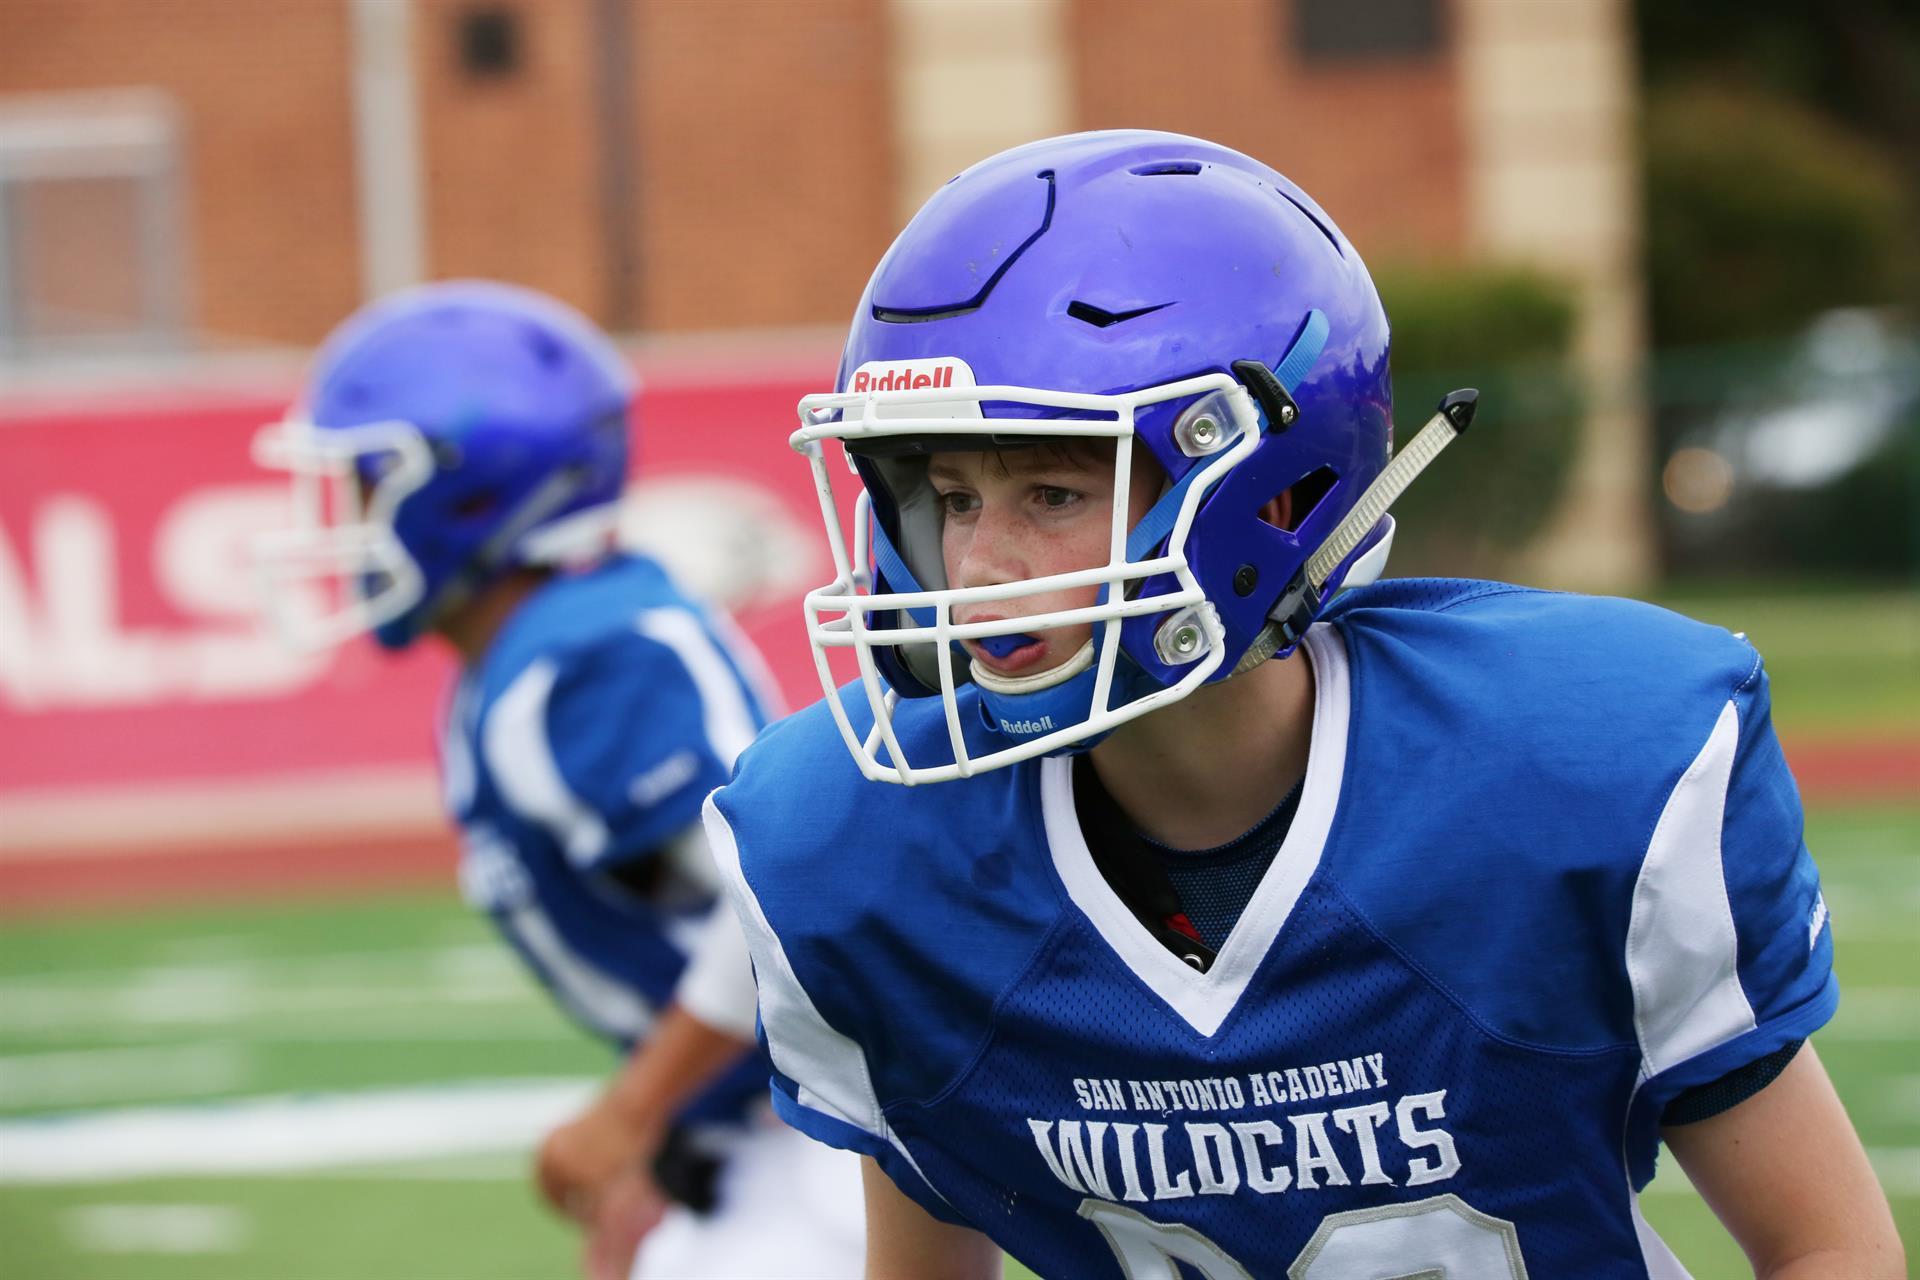 2018 Wildcats football season